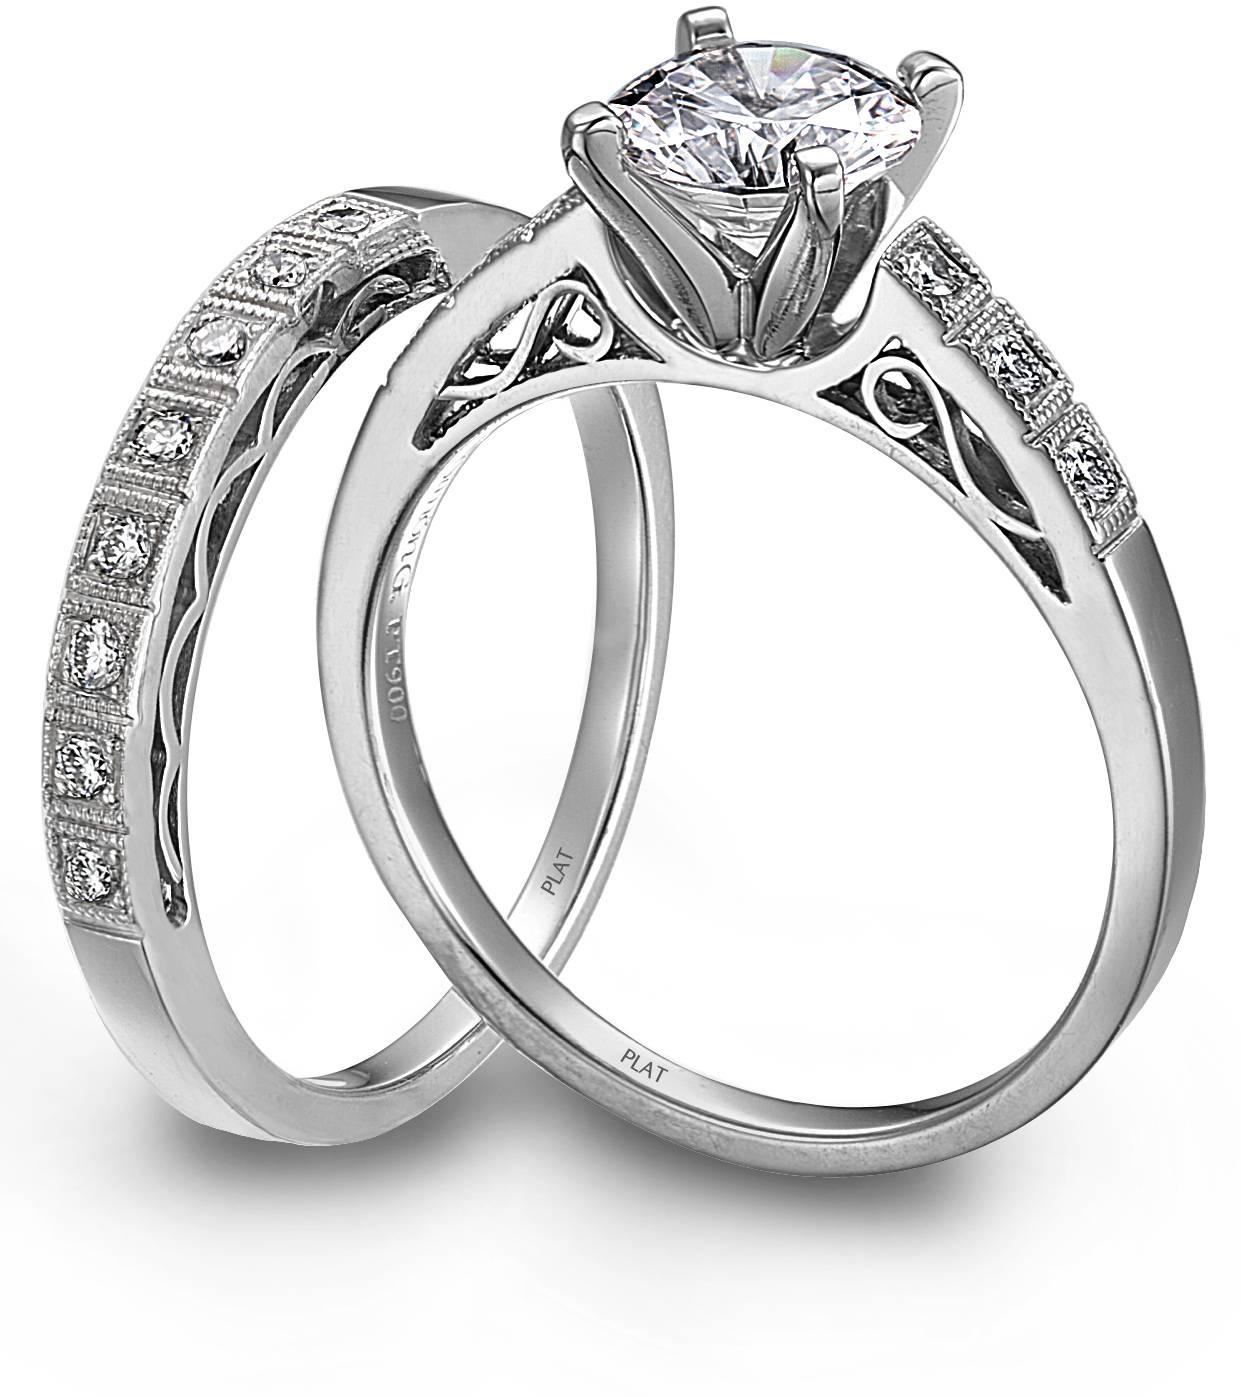 Platinum Diamond Wedding Rings | Ipunya For Diamonds Wedding Rings (View 13 of 15)